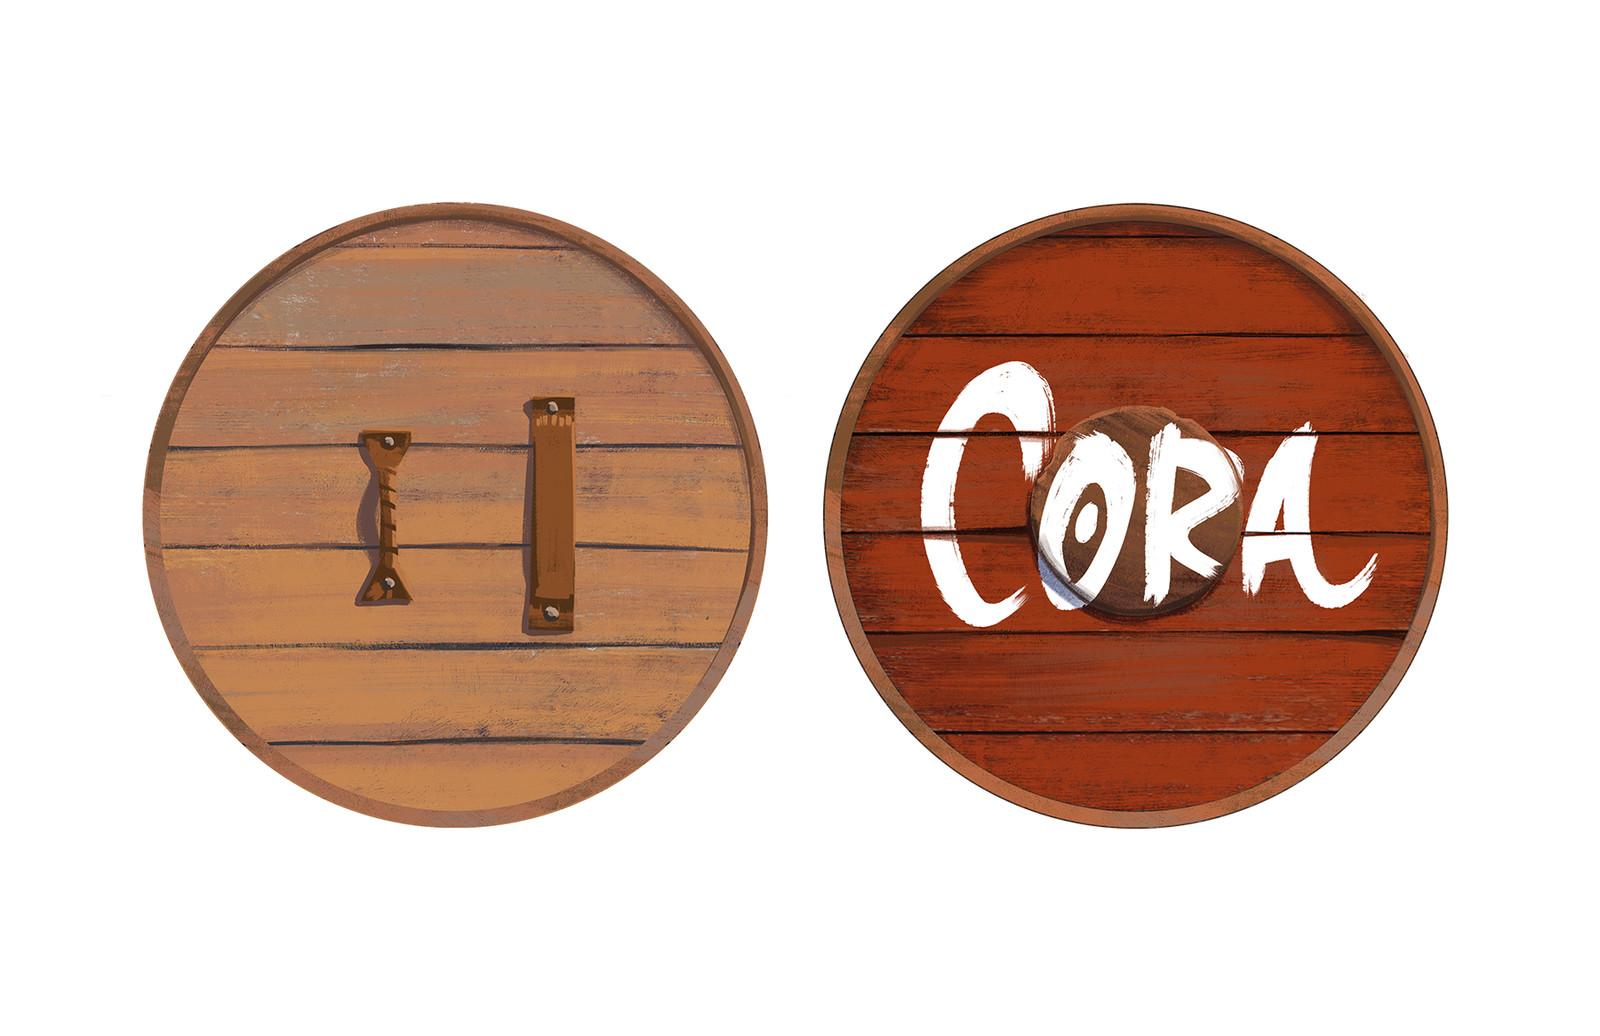 Cora's wooden shield